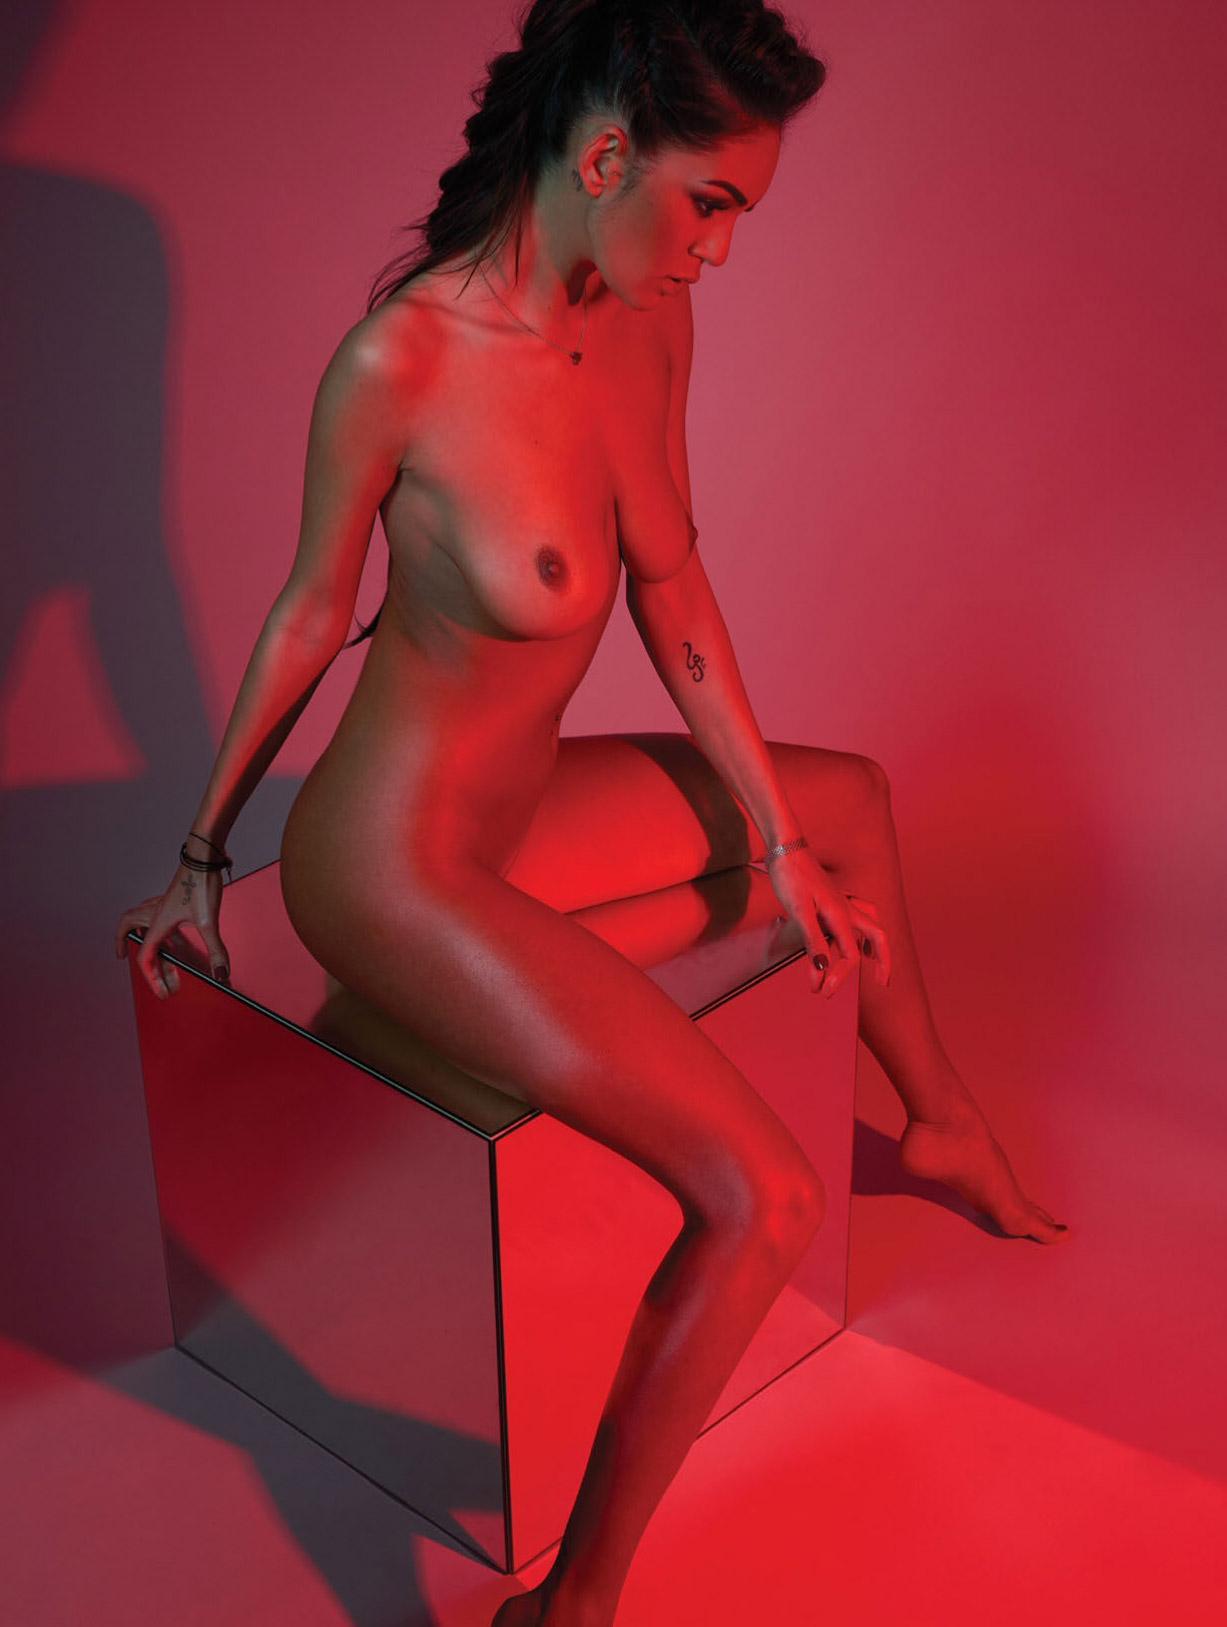 Andreea Simon nude by Daniel Ilinca - Penthouse Australia november 2016